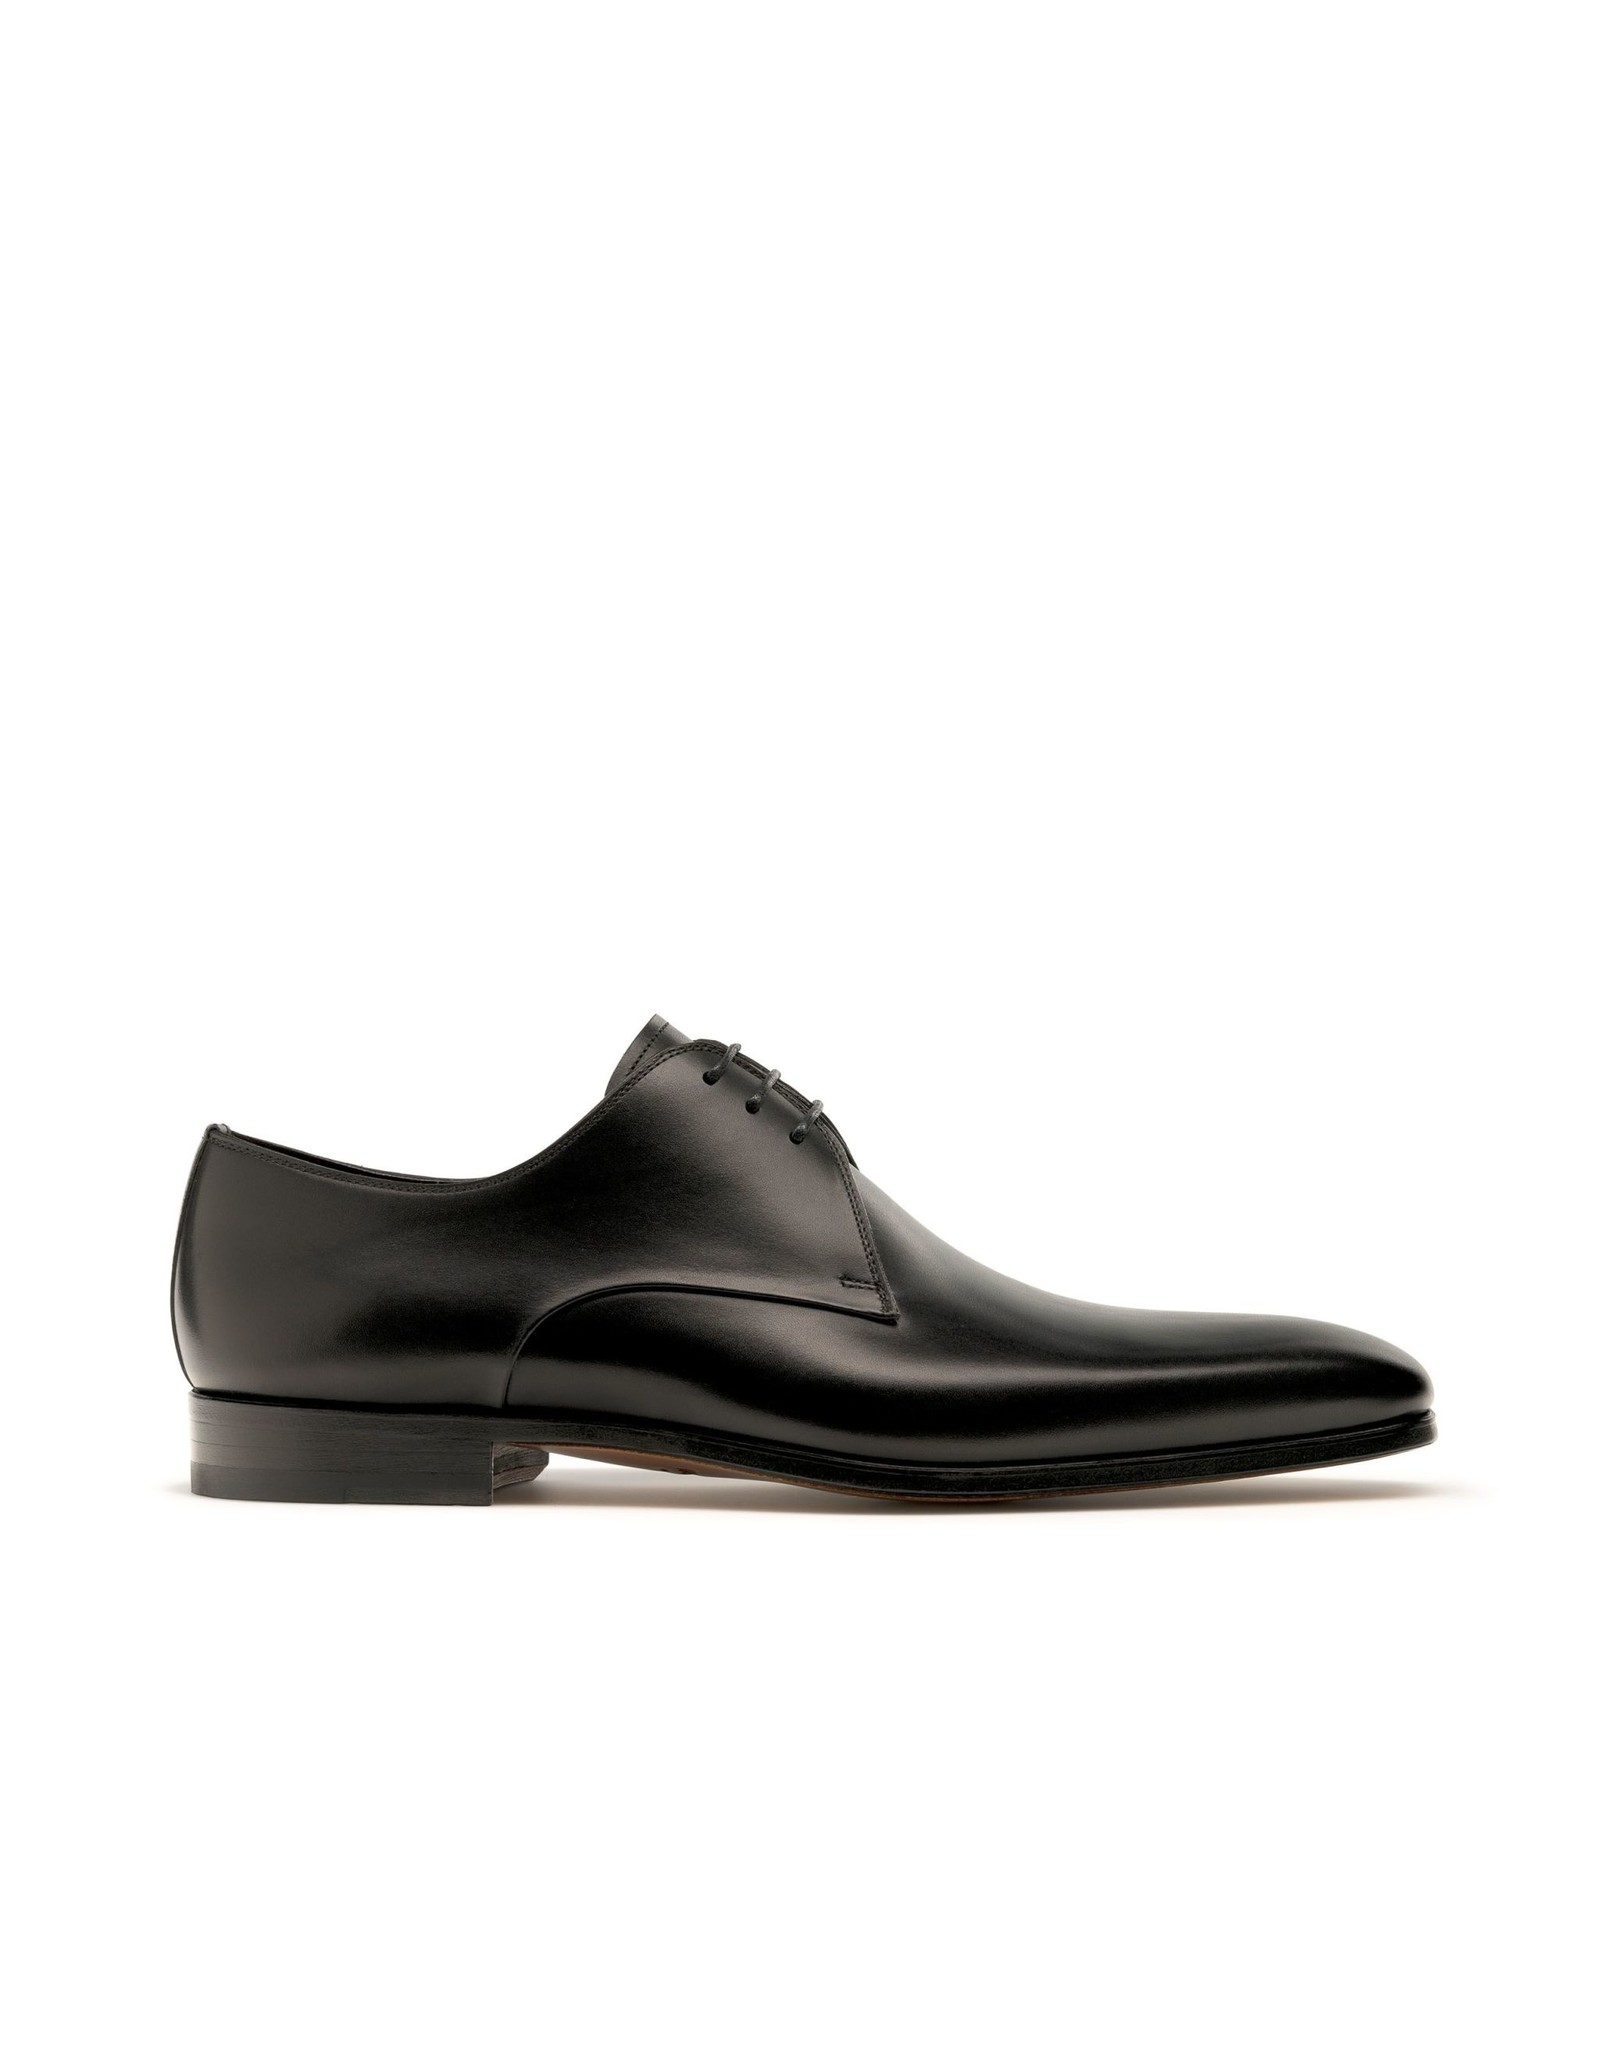 Magnanni Shoe 360 Lining Black